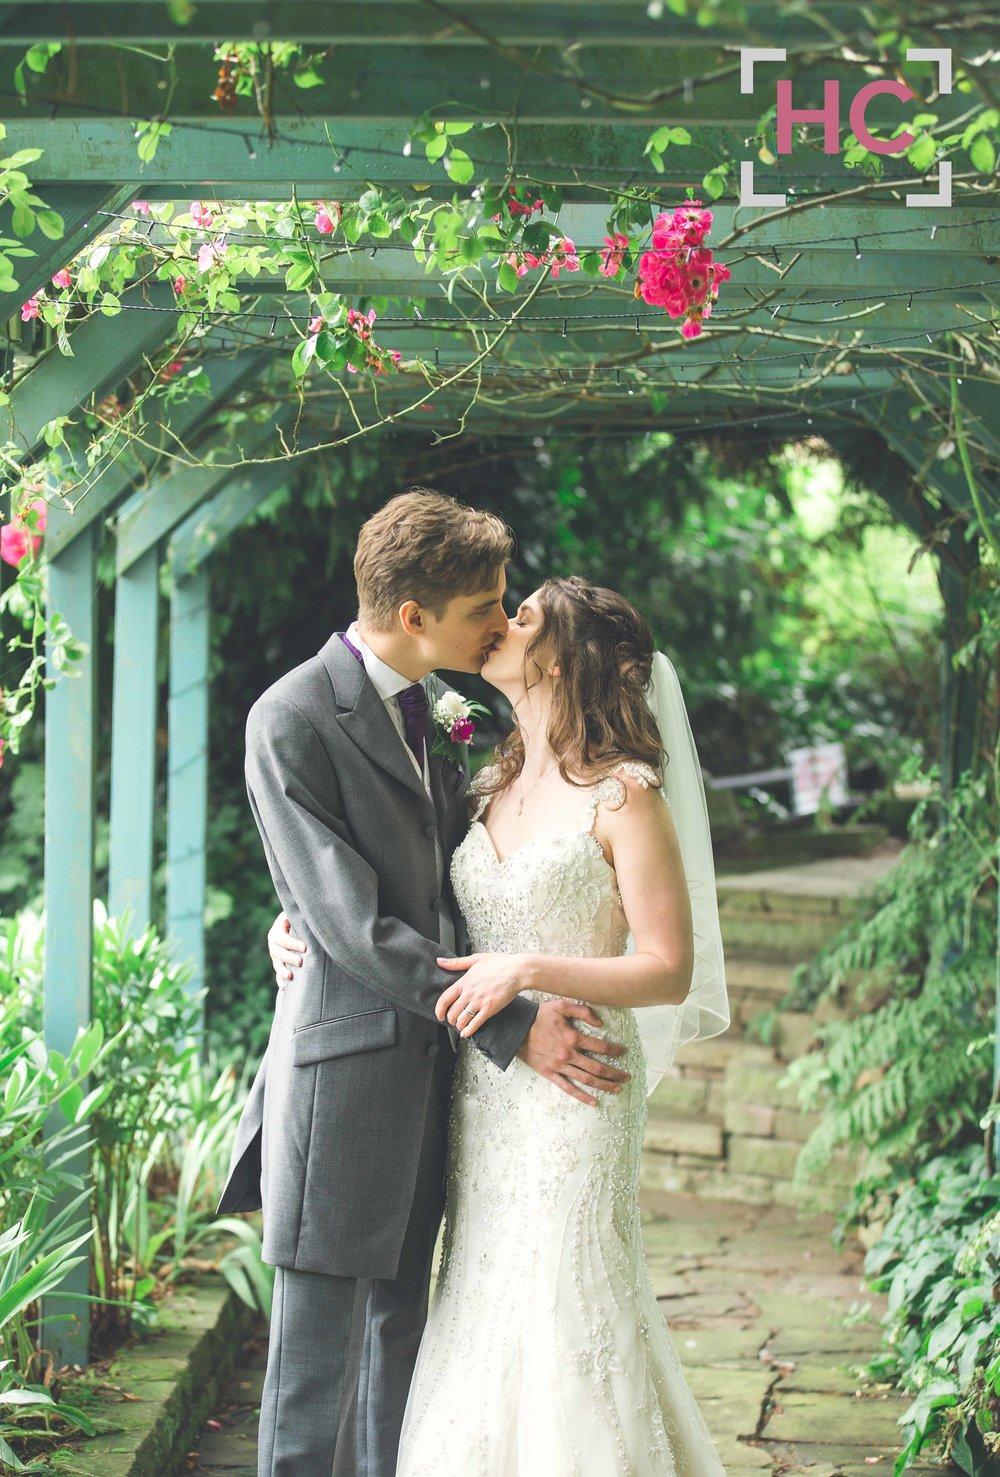 Thomas & Marcia's Wedding_Helen Cotton Photography©36.JPG